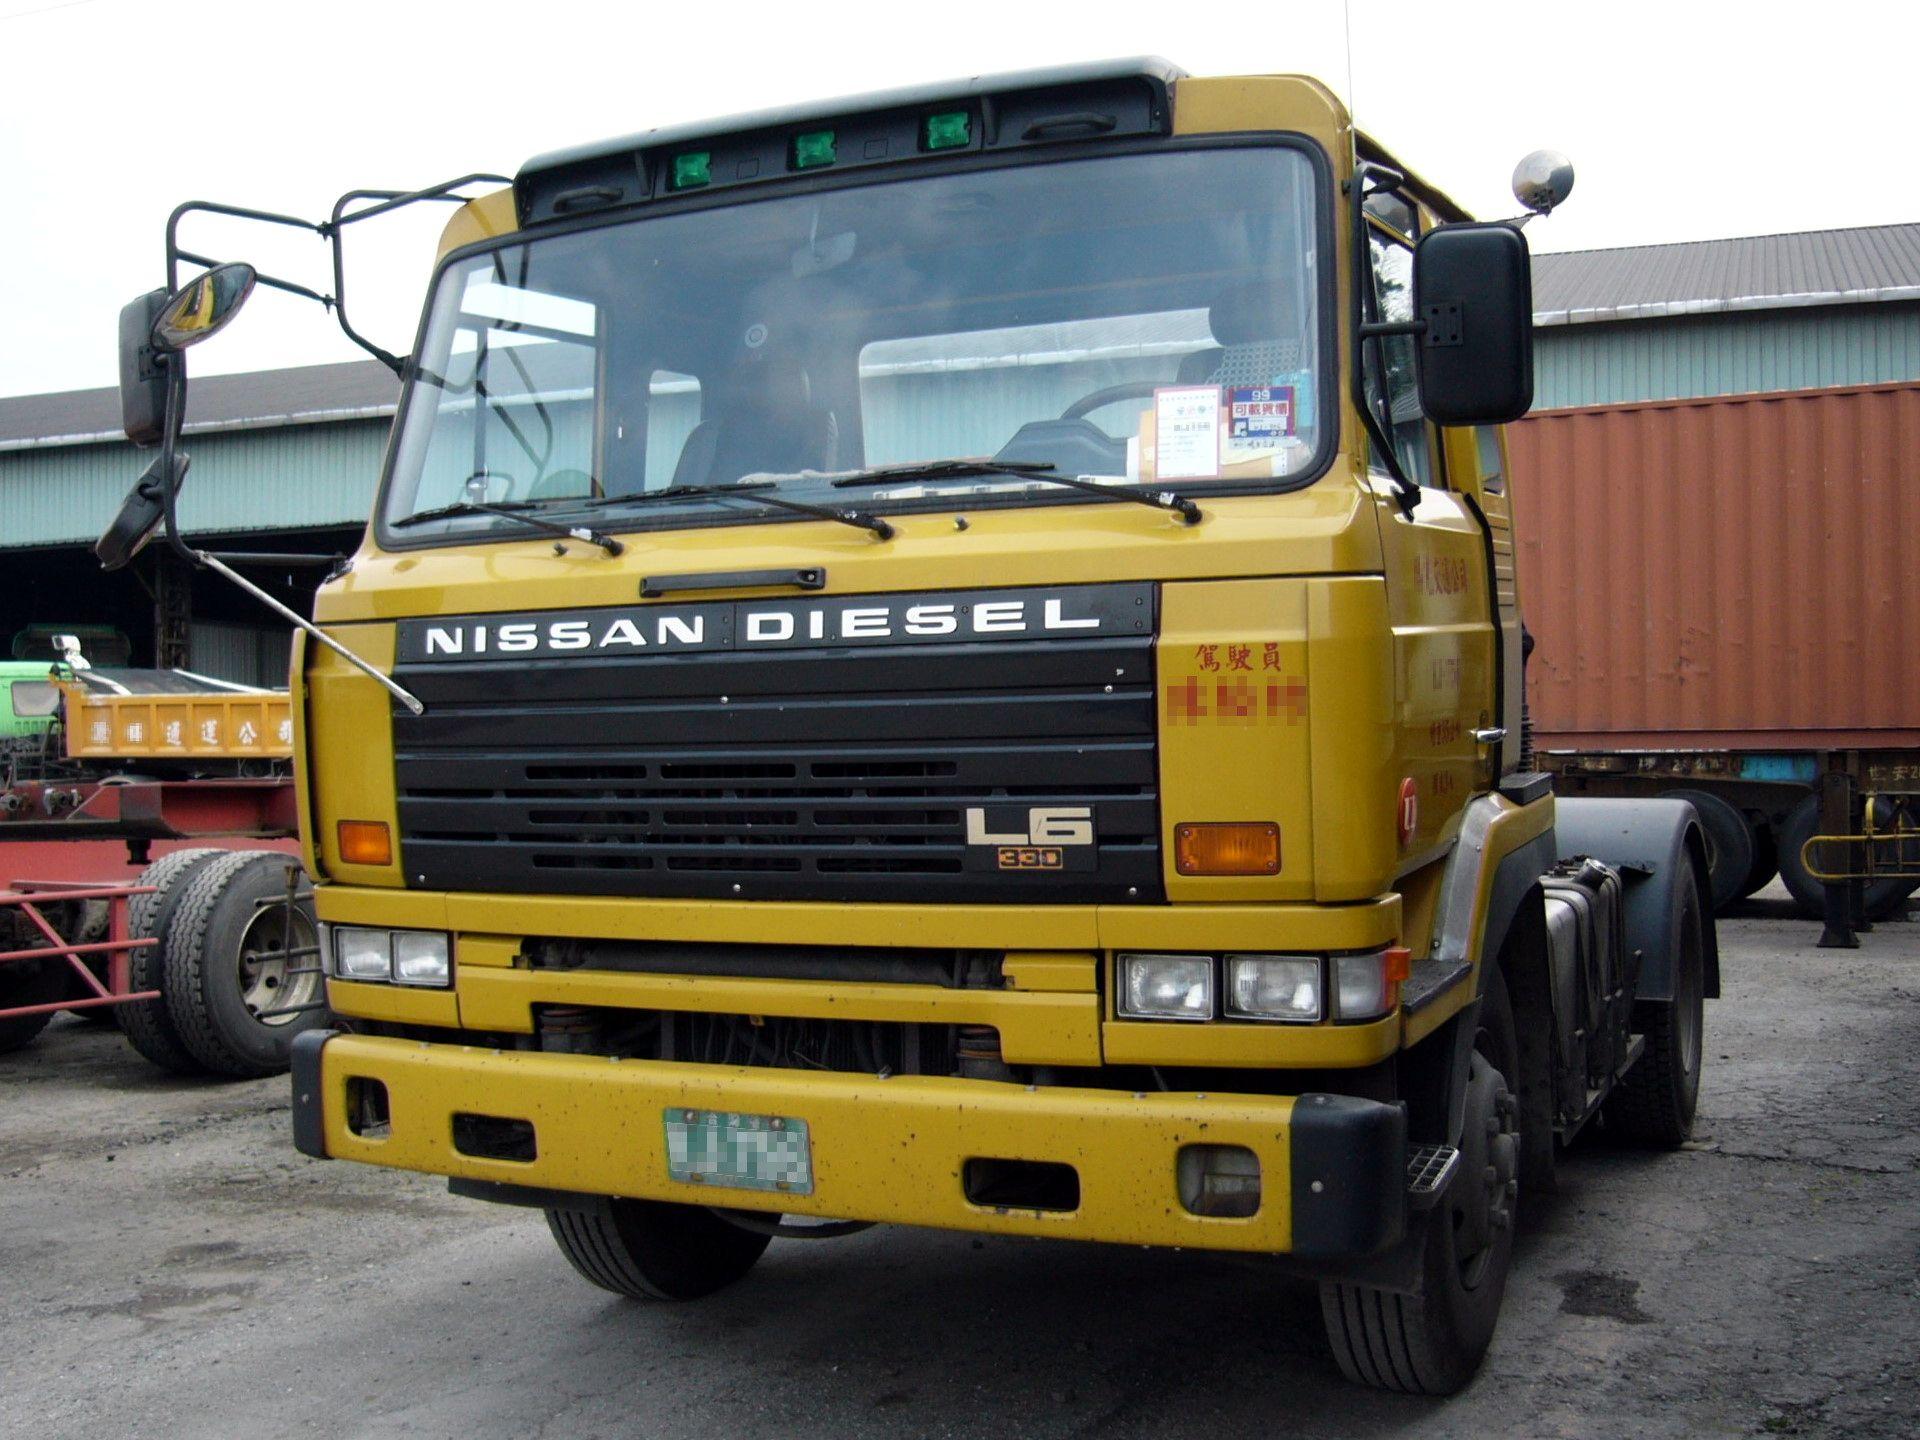 Nissan Diesel L6 330 Heavyweight Party Pinterest